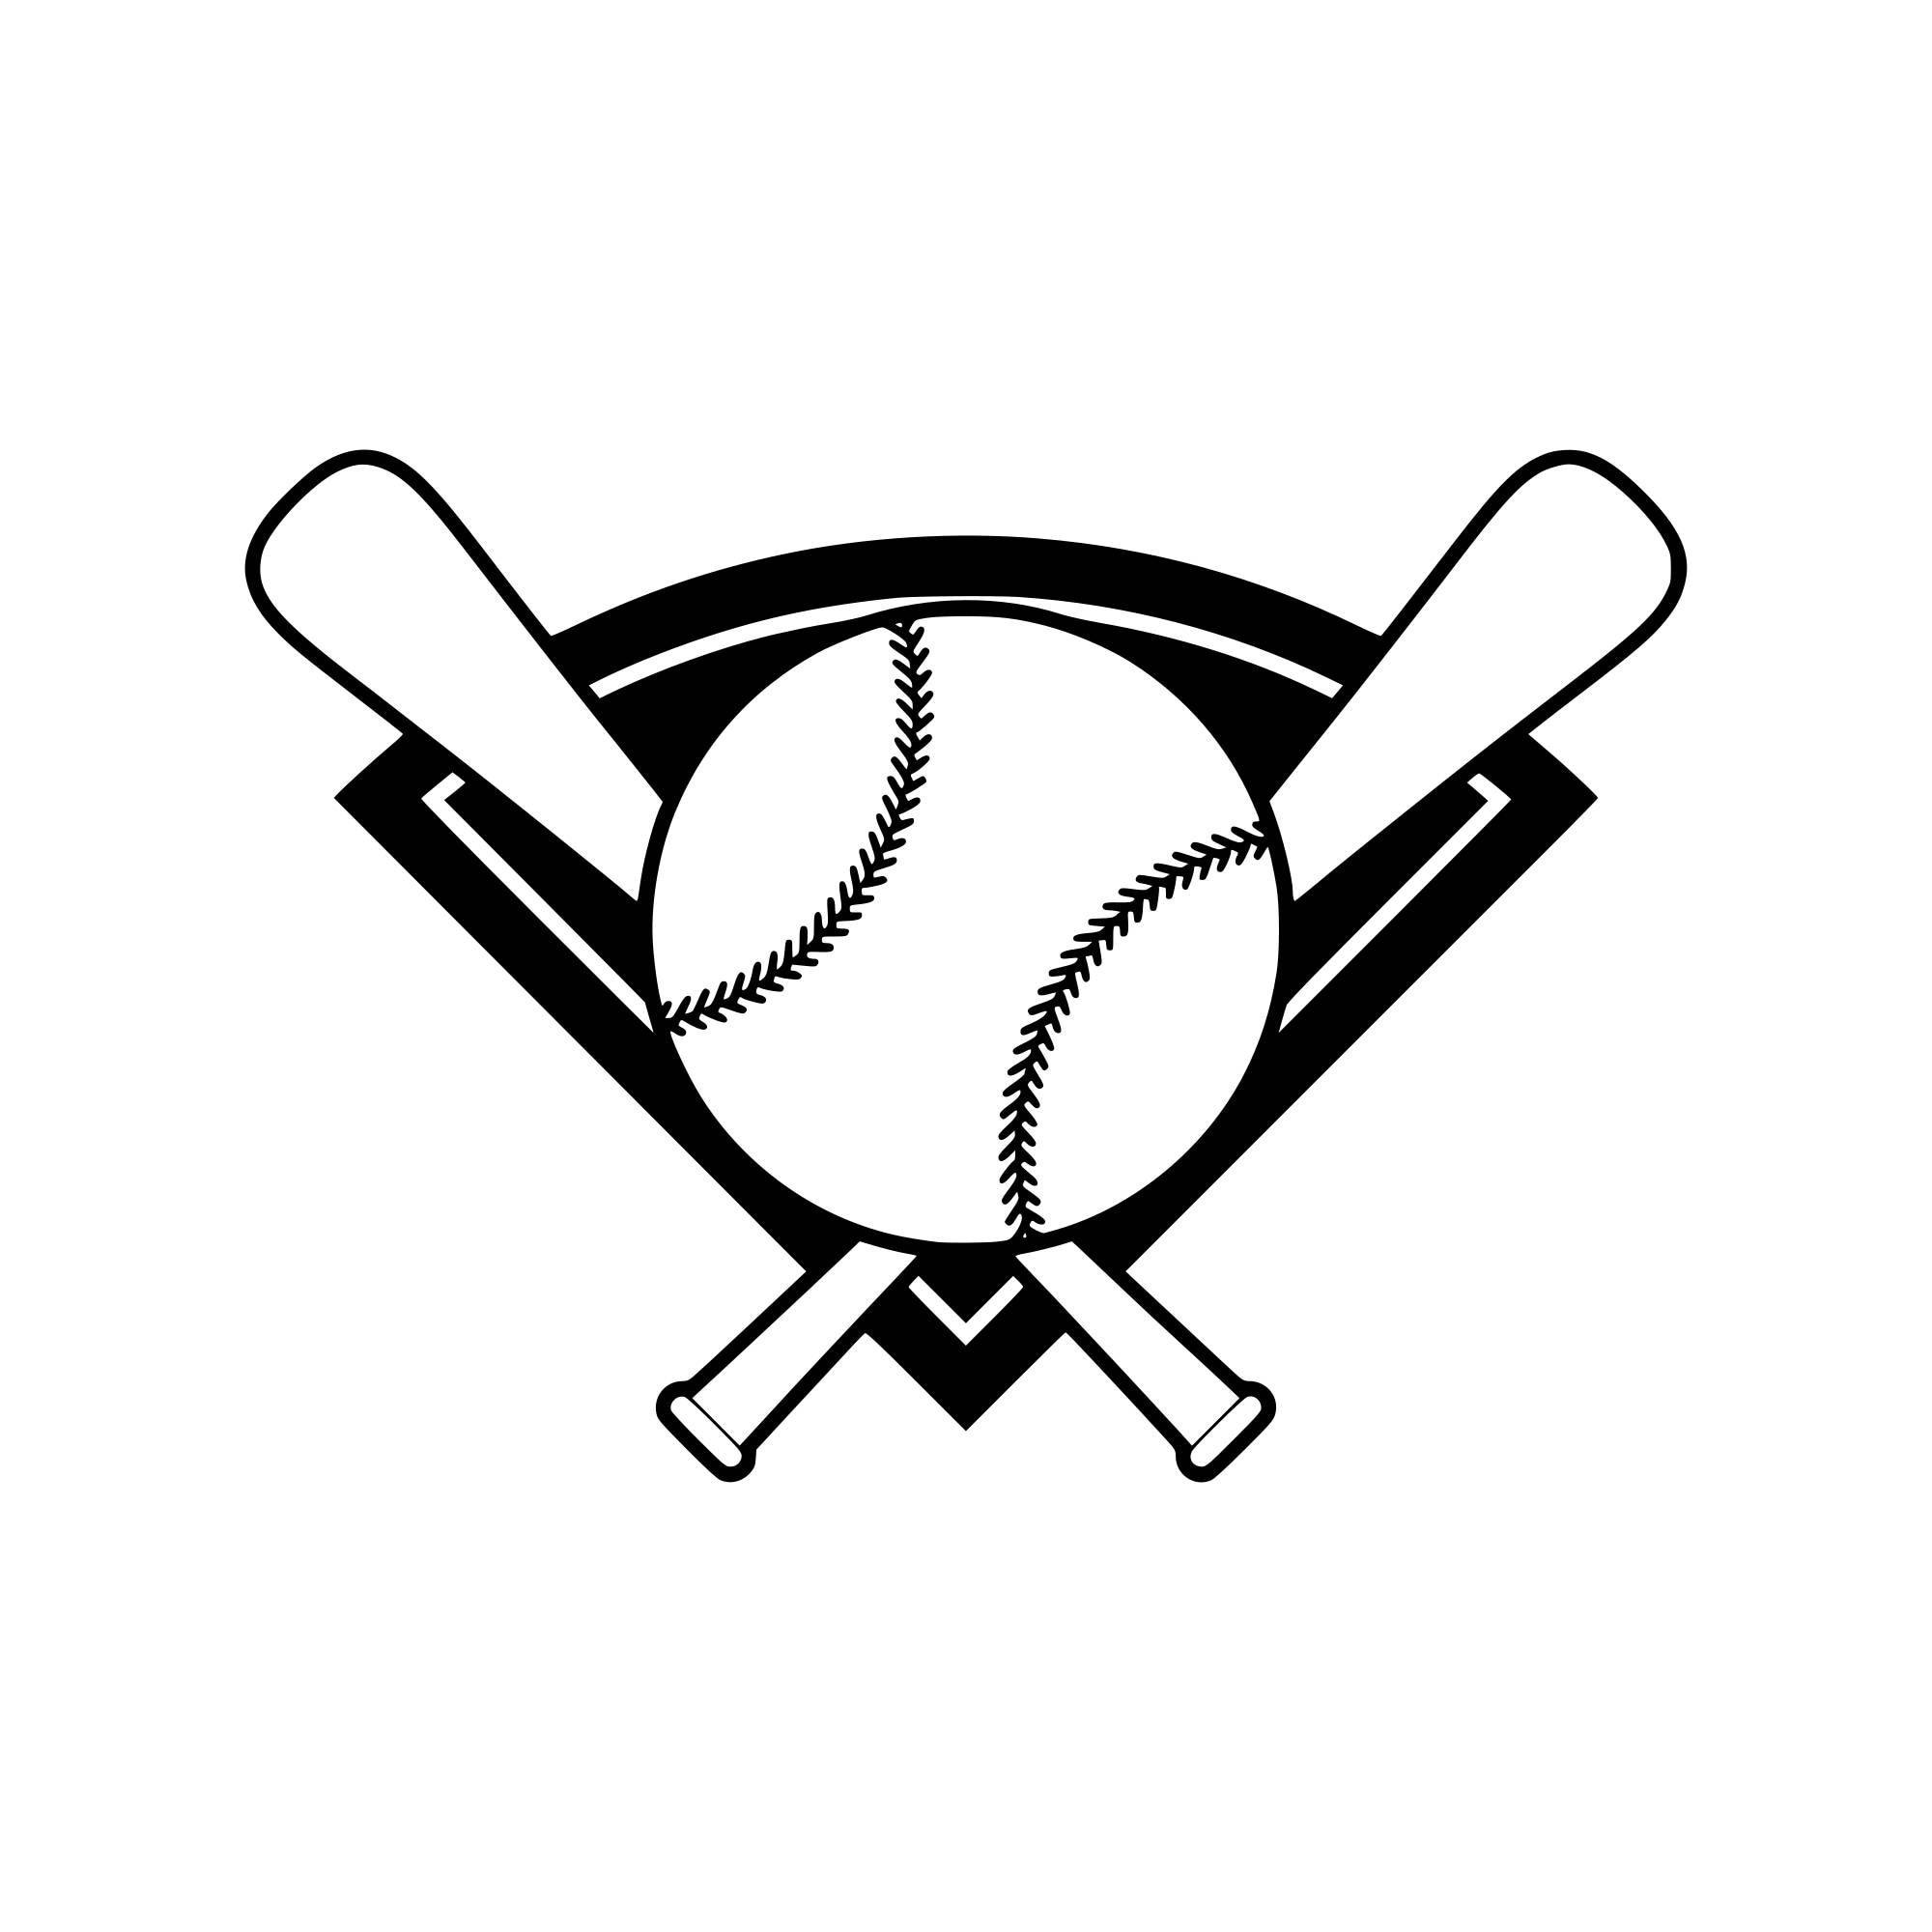 Baseball Bat Svg Baseball Svg Baseball Silhouette Baseball Cut Etsy